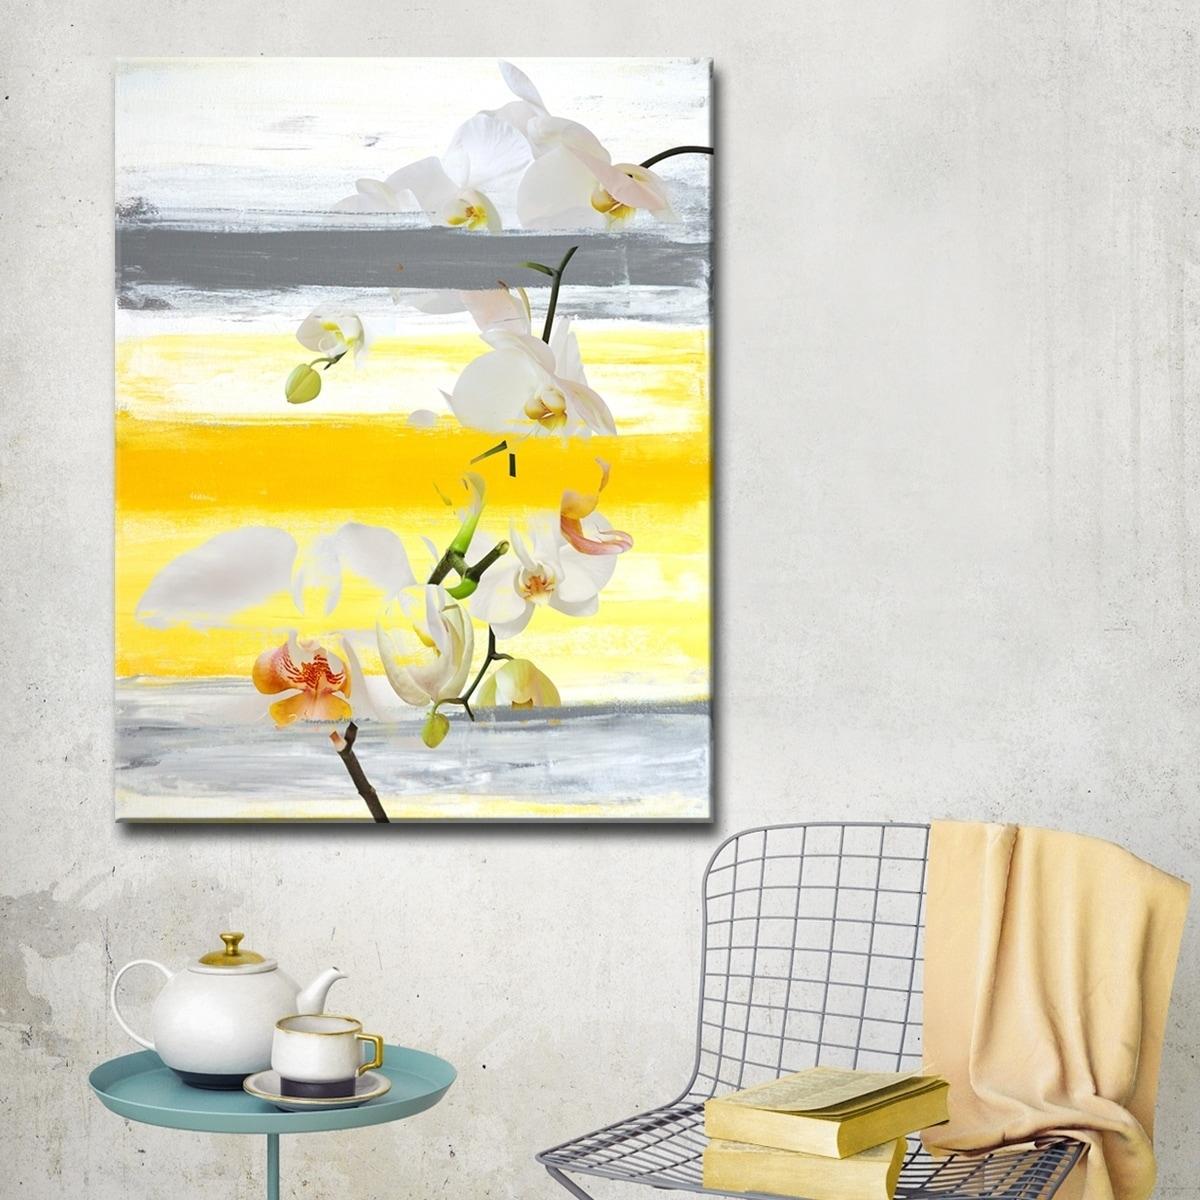 Romantic Art Gallery | Shop our Best Home Goods Deals Online at ...